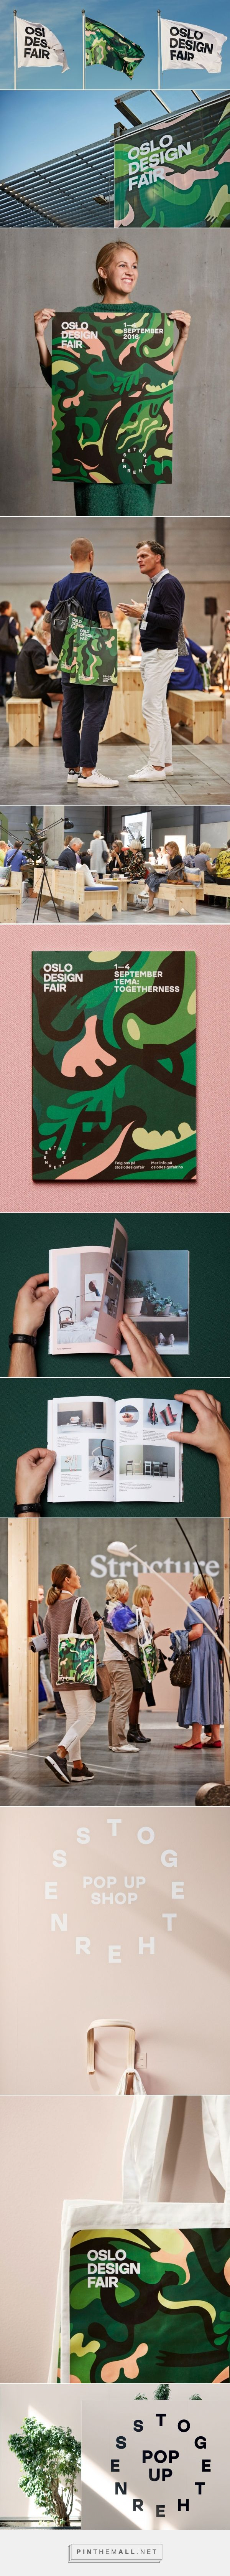 Oslo Design Fair F2016 – Bielke&Yang - created via https://pinthemall.net